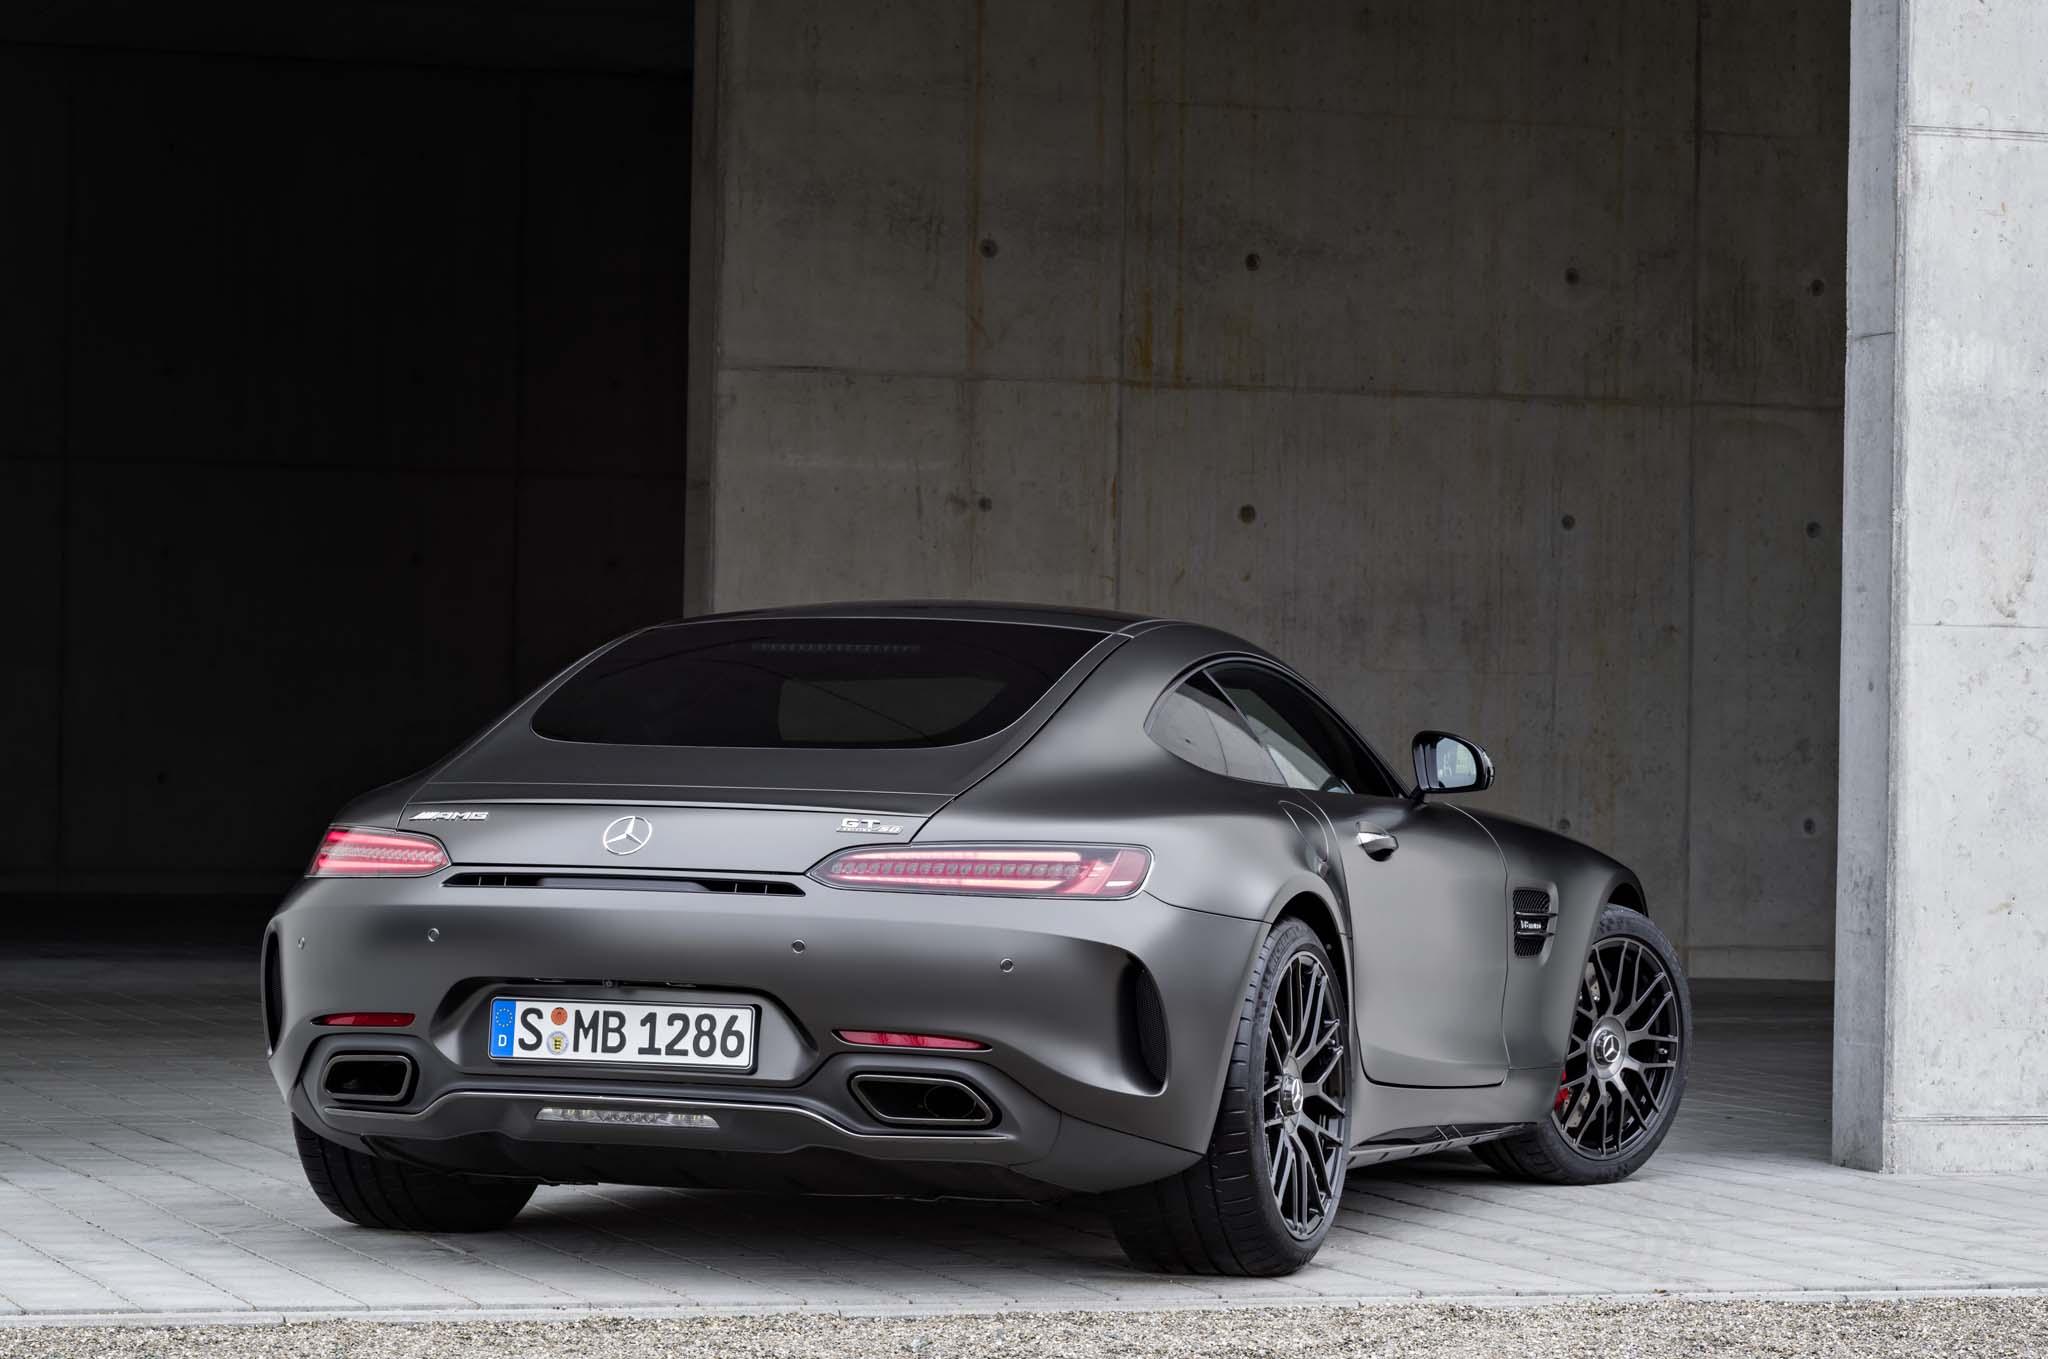 http://st.automobilemag.com/uploads/sites/11/2017/01/2018-Mercedes-AMG-GT-C-Coupe-Edition-50-rear-end.jpg